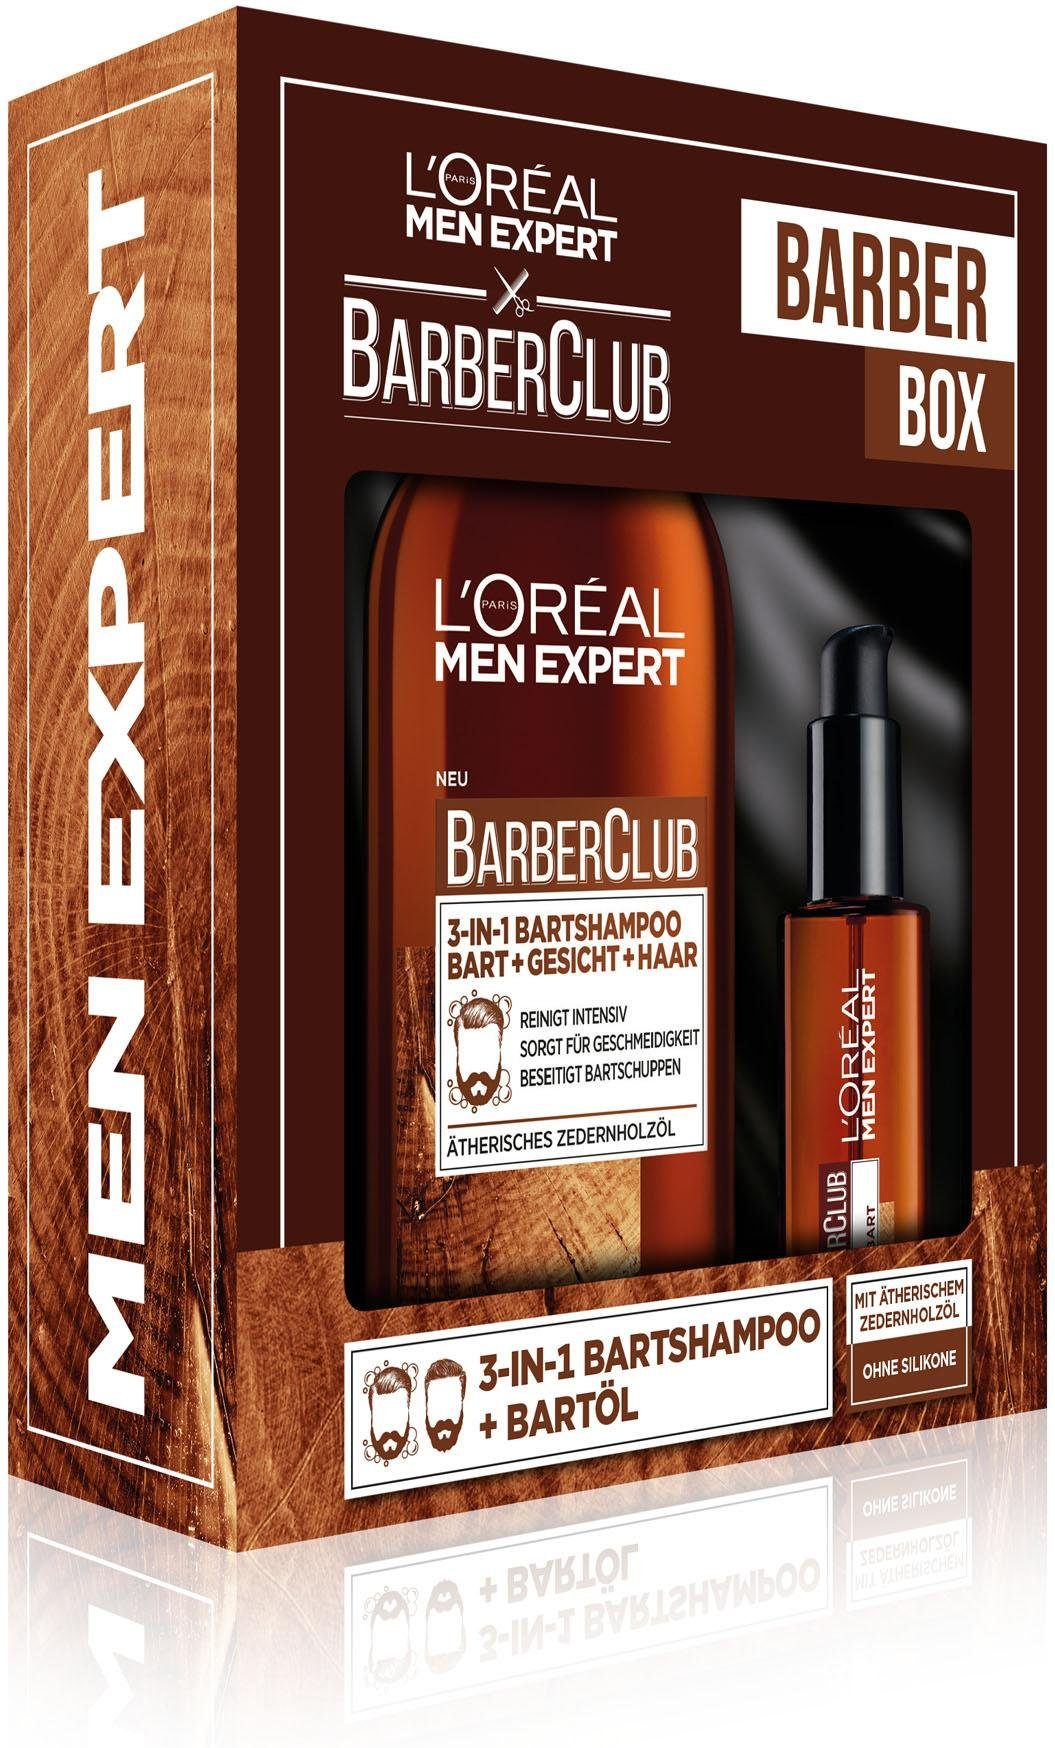 L'Oréal Paris Men Expert, »Barber Club Bartöl und 3-in-1 Bartshampoo«, Geschenkset (2-tlg.)